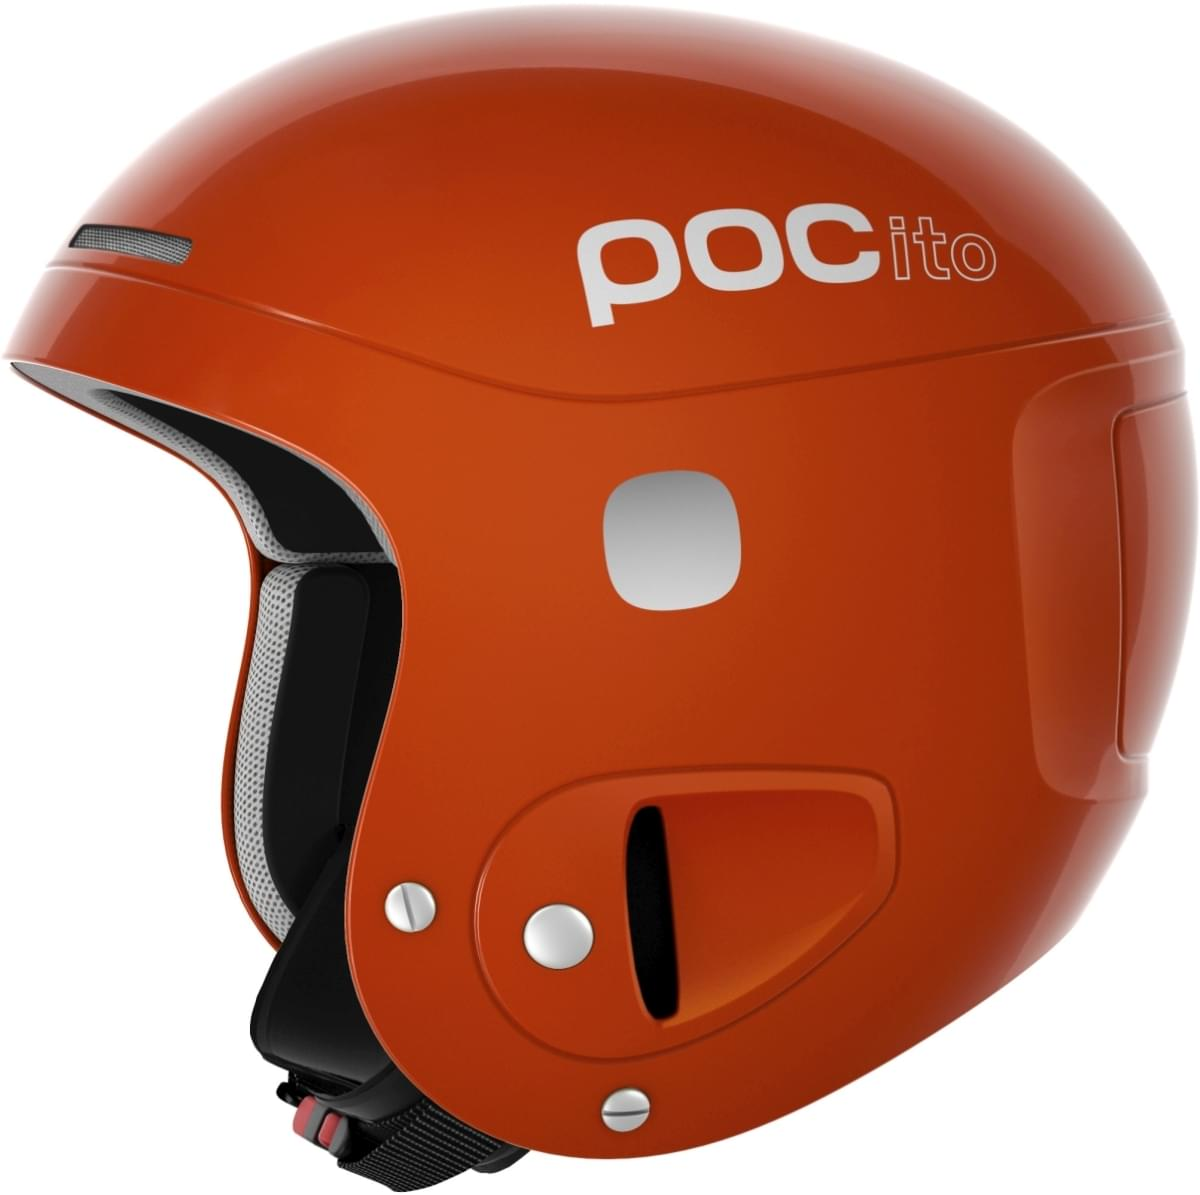 POC POCito Skull-fluorescent orange adj. 51-54